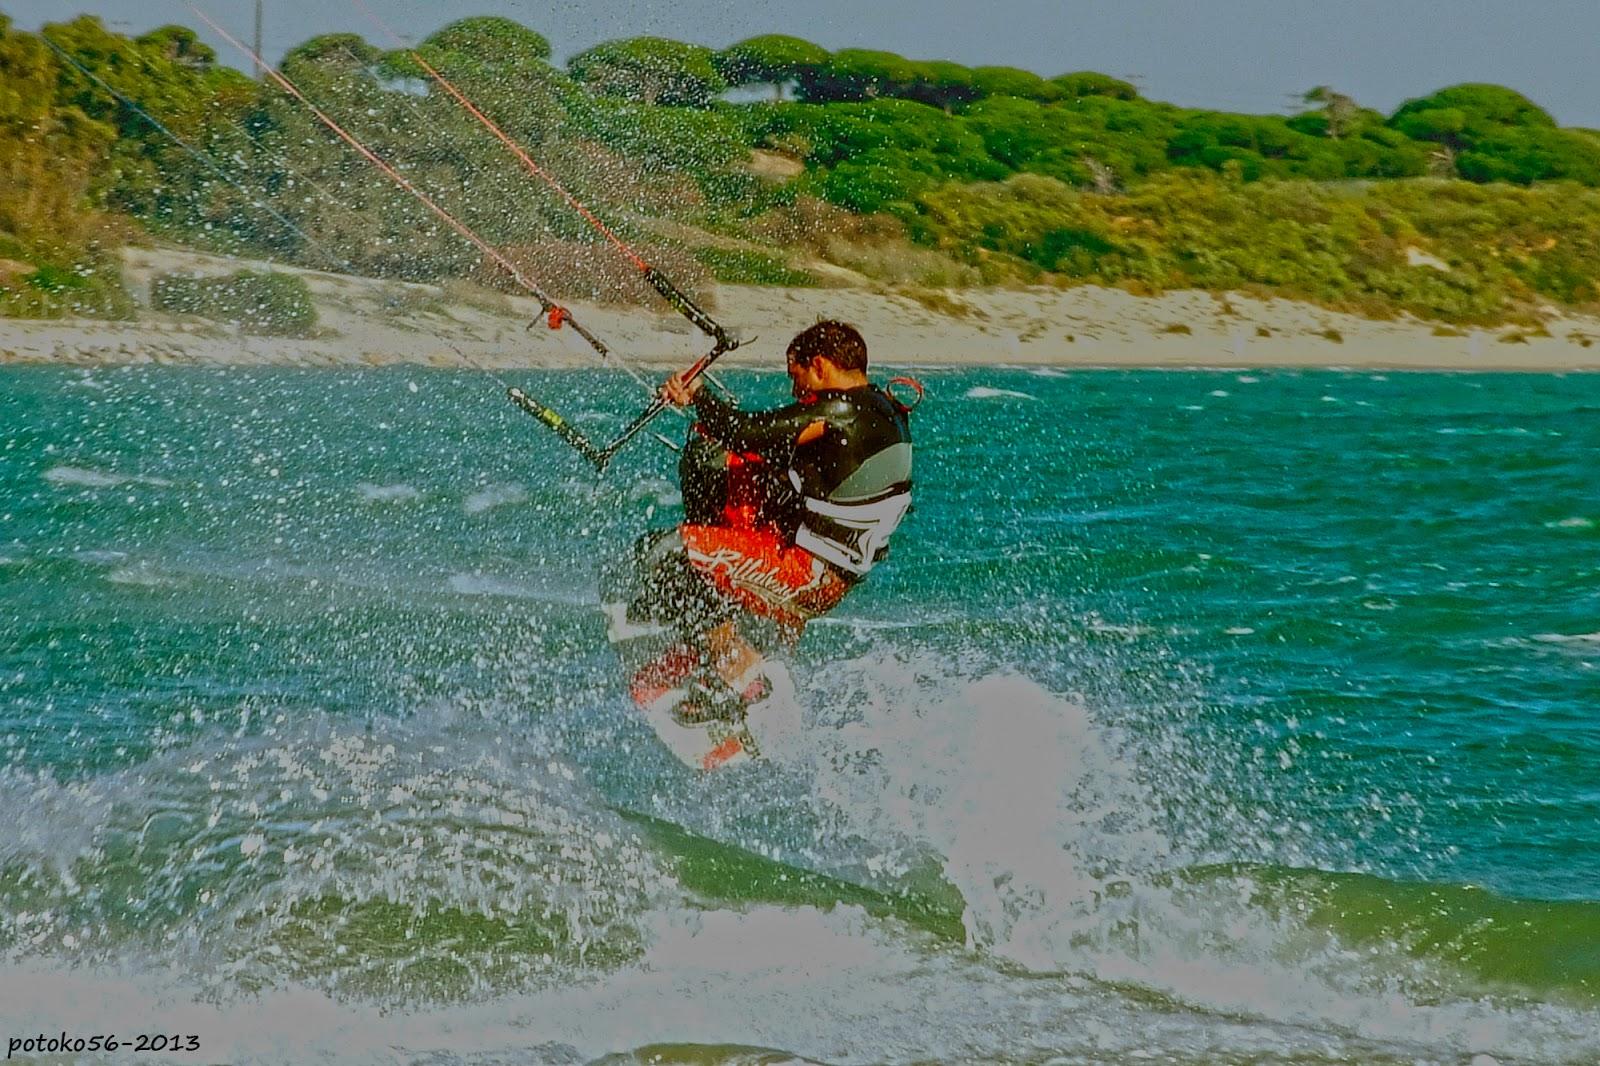 Flaysurf en la playa del Chorrillo Rota